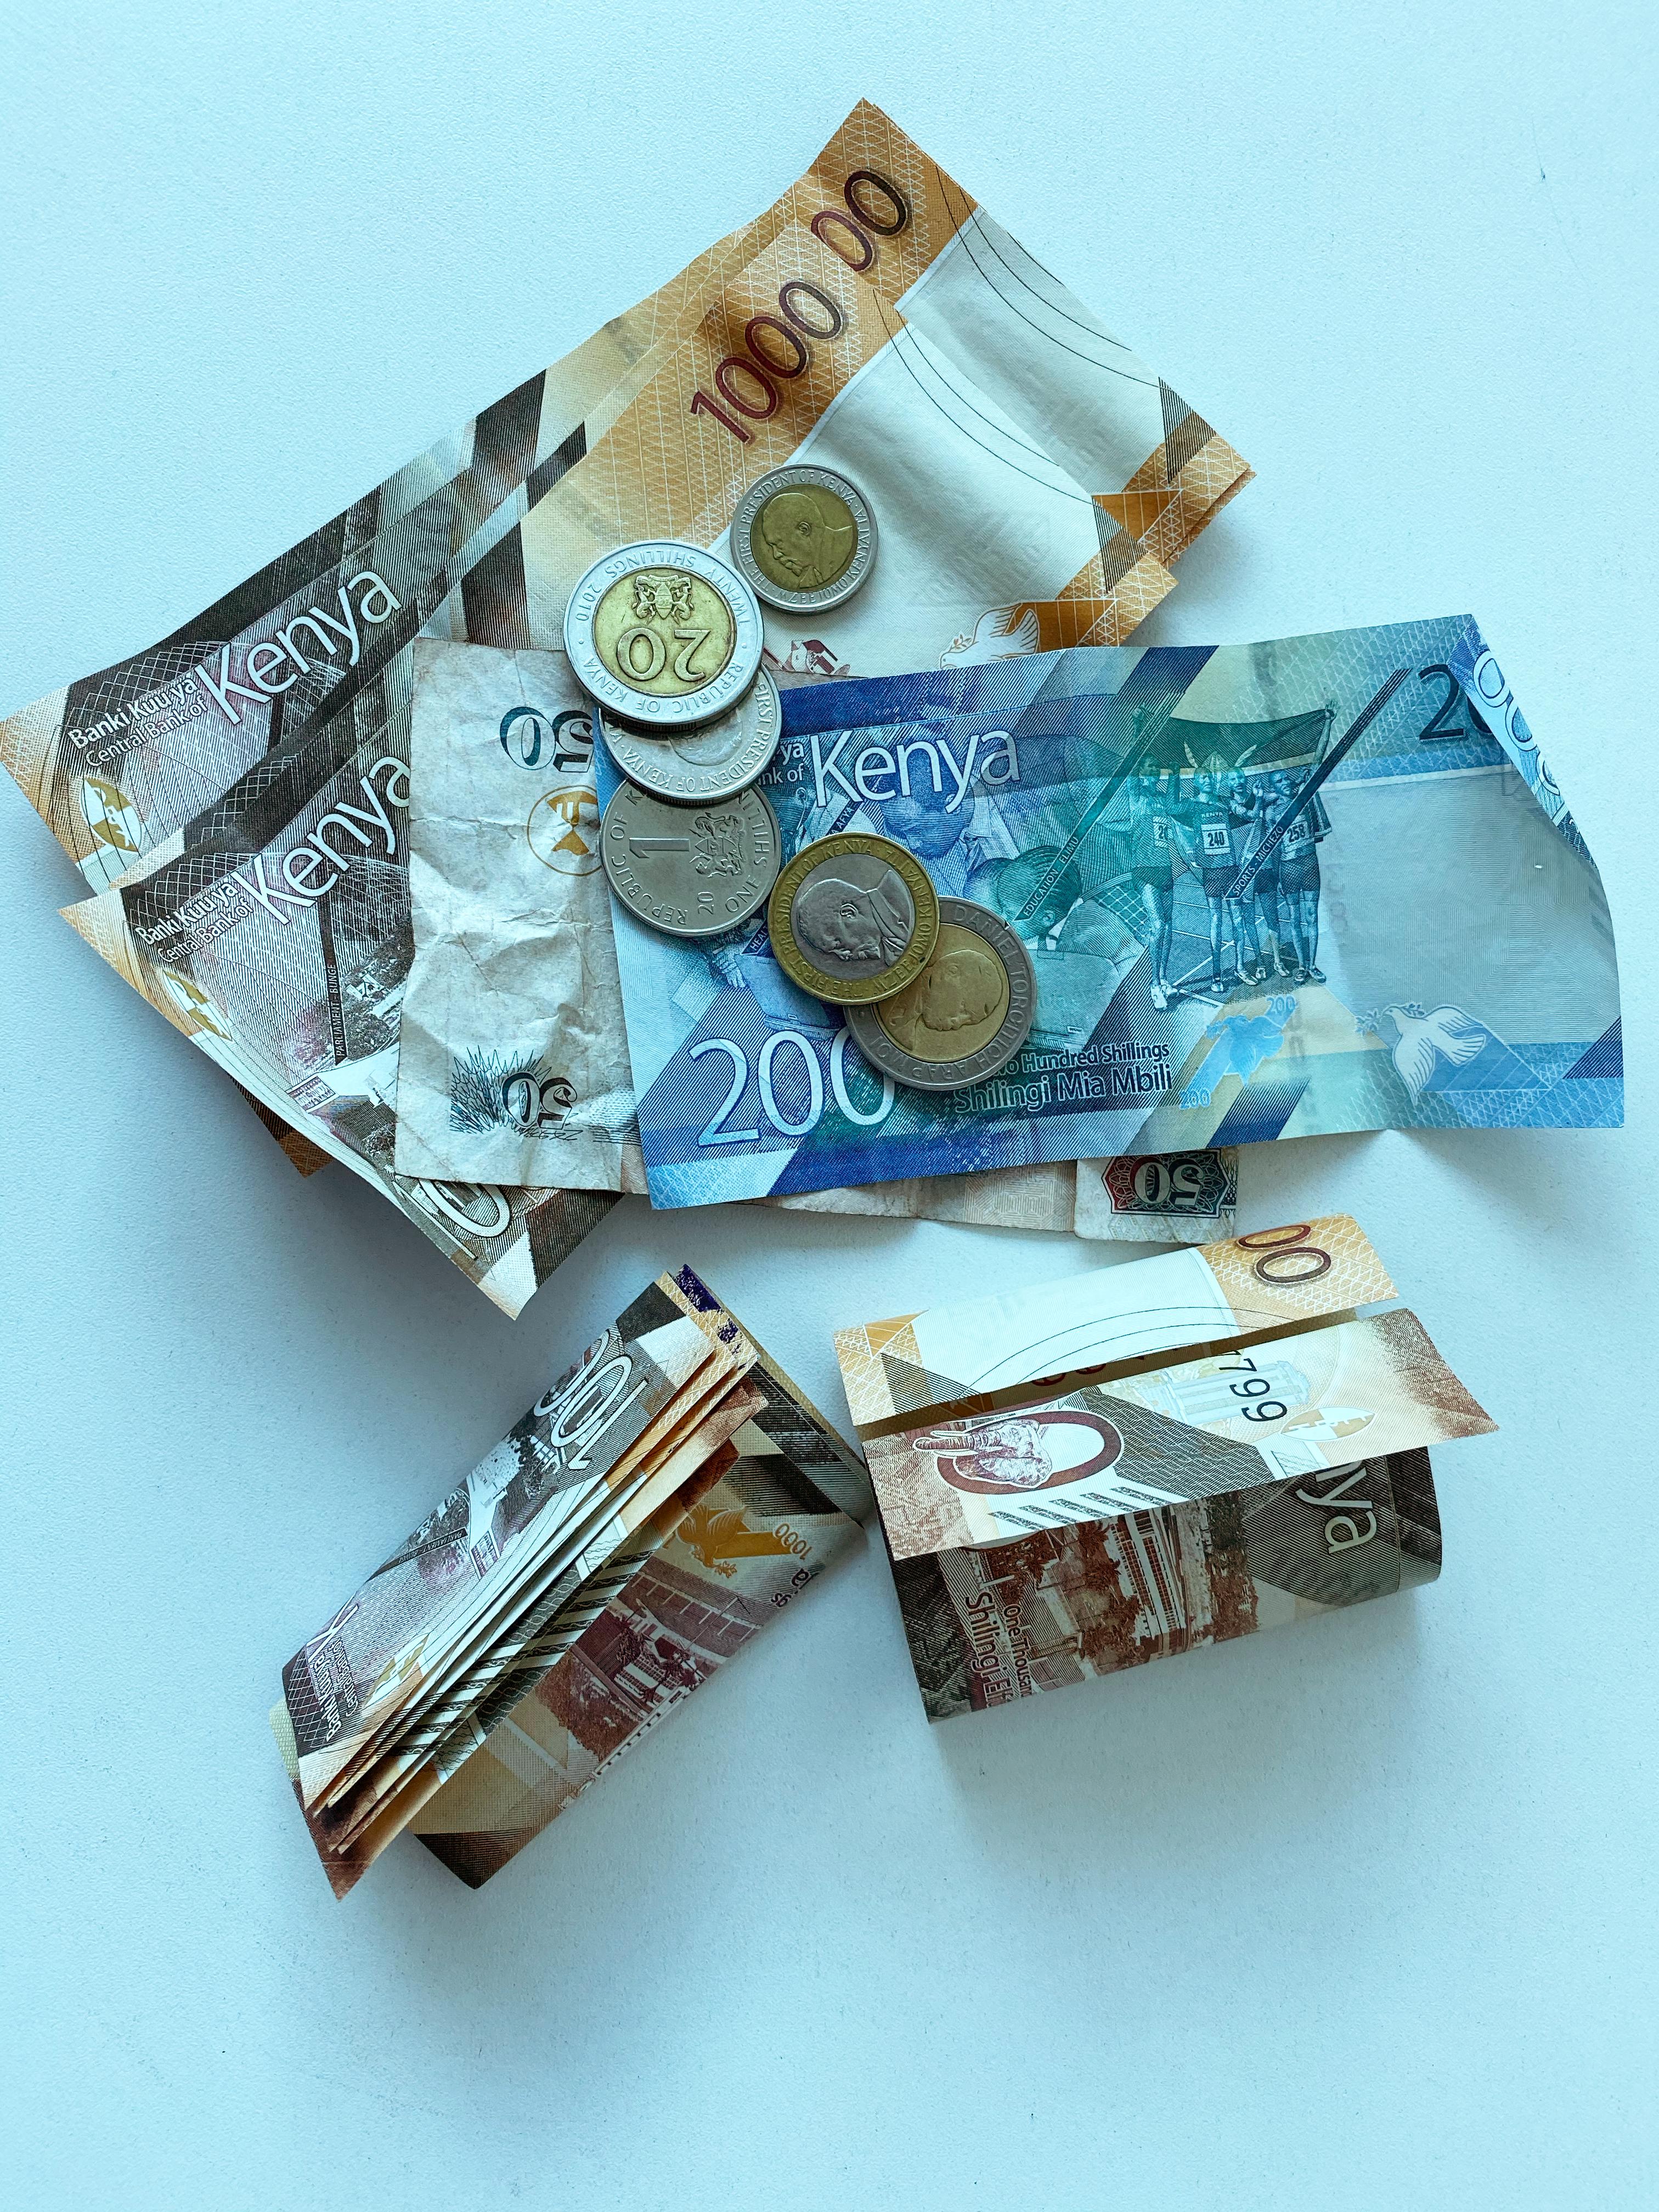 kenyan-money-financial-inclusion